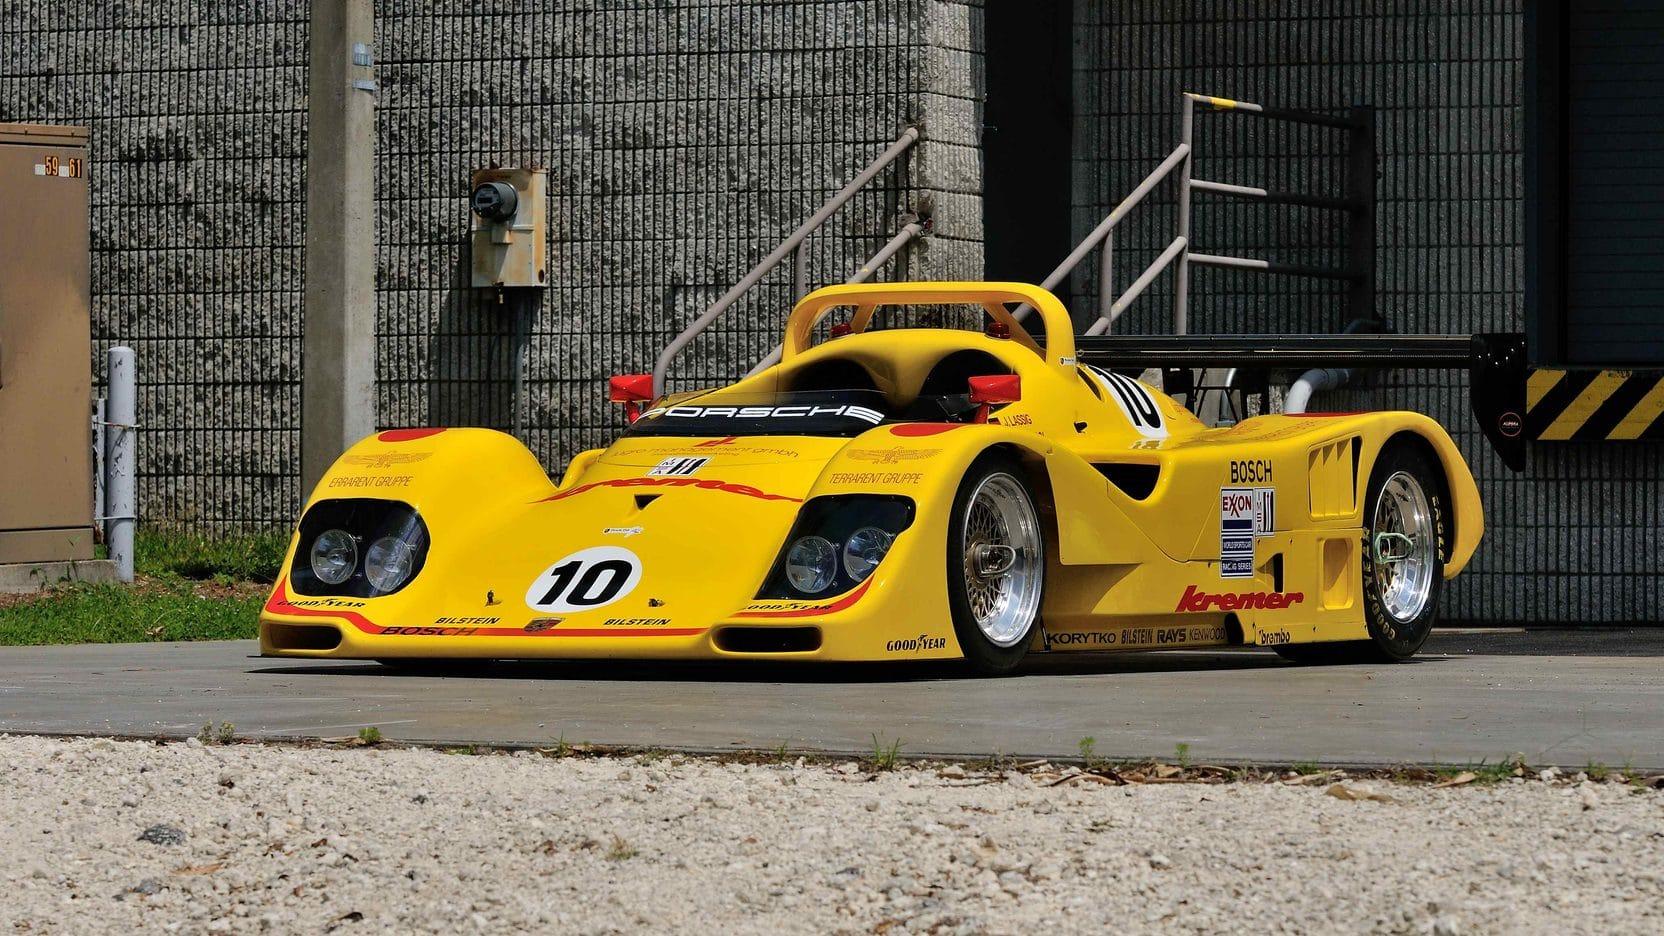 Porsche K8 Spyder, l'ultime délire des frères Kremer